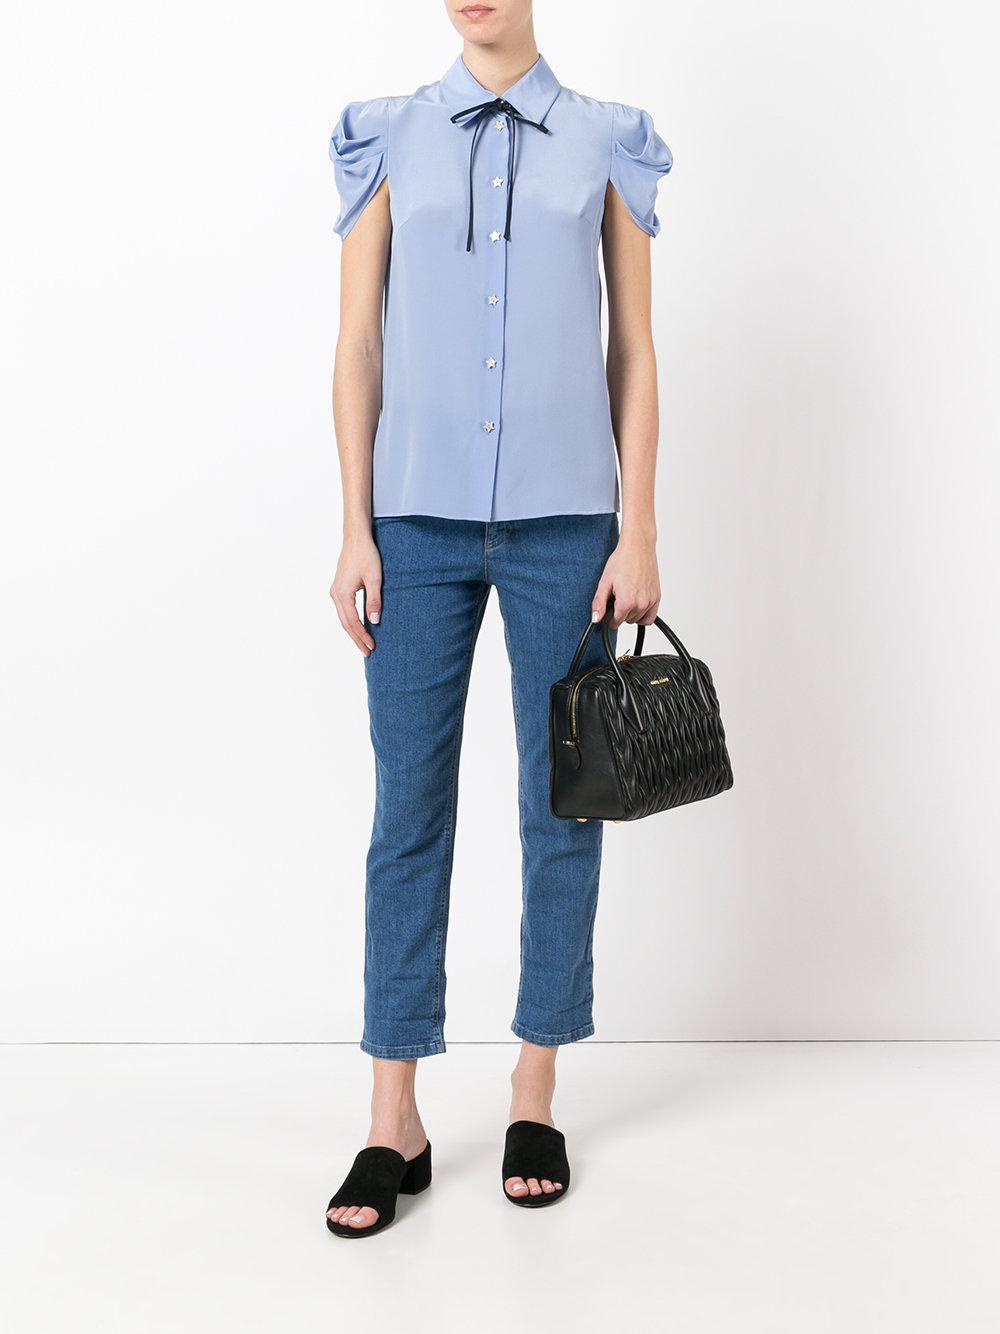 Miu Miu - Quilted Tote Bag - Women - Calf Leather - One Size in Black